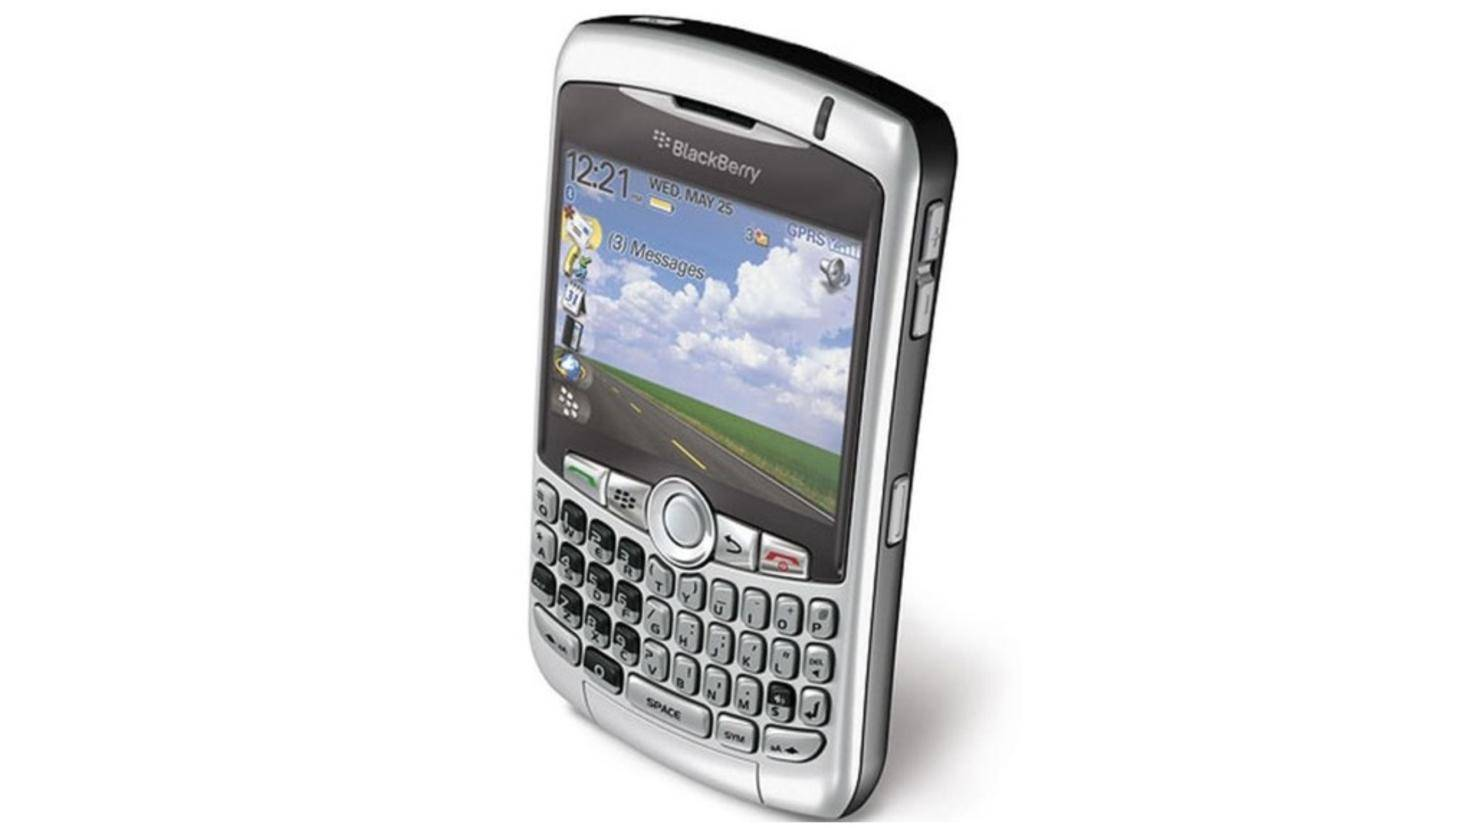 blackberry-curve